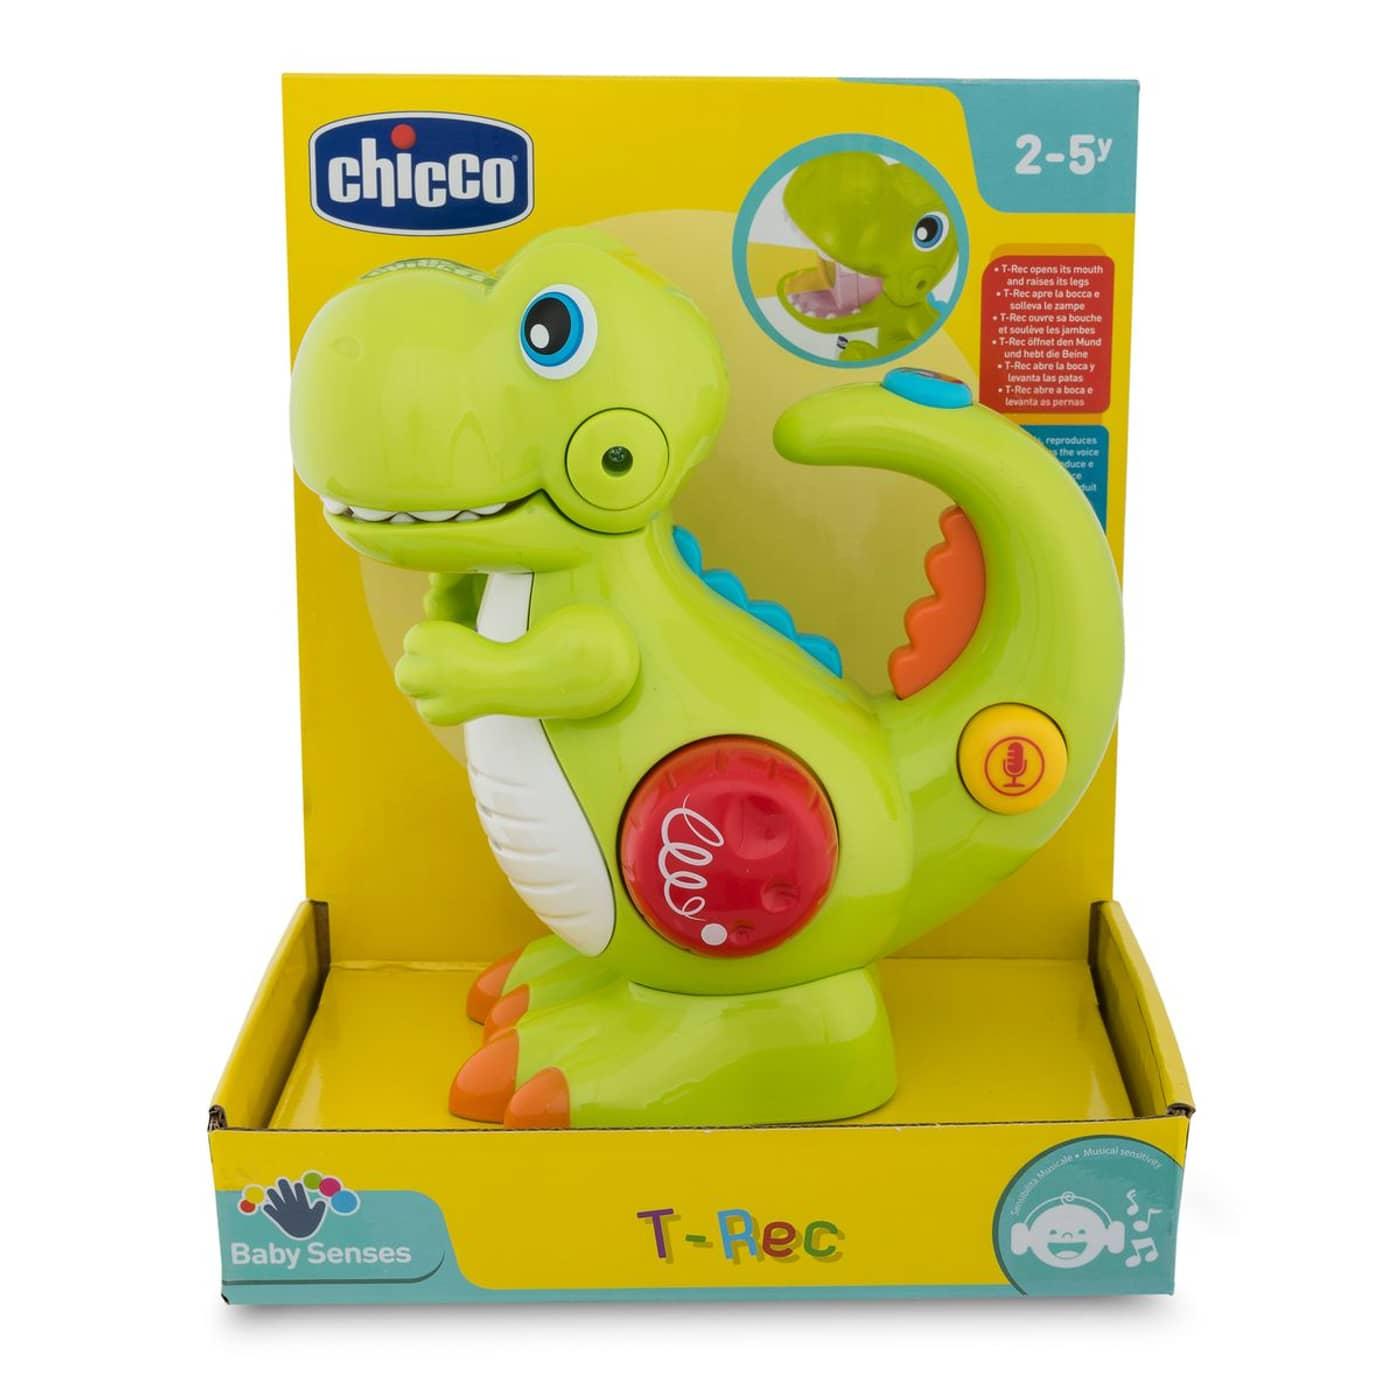 Jucarie Chicco dinozaurul T-Rec, cu inregistrare vocala si lanterna, 2 -5 ani